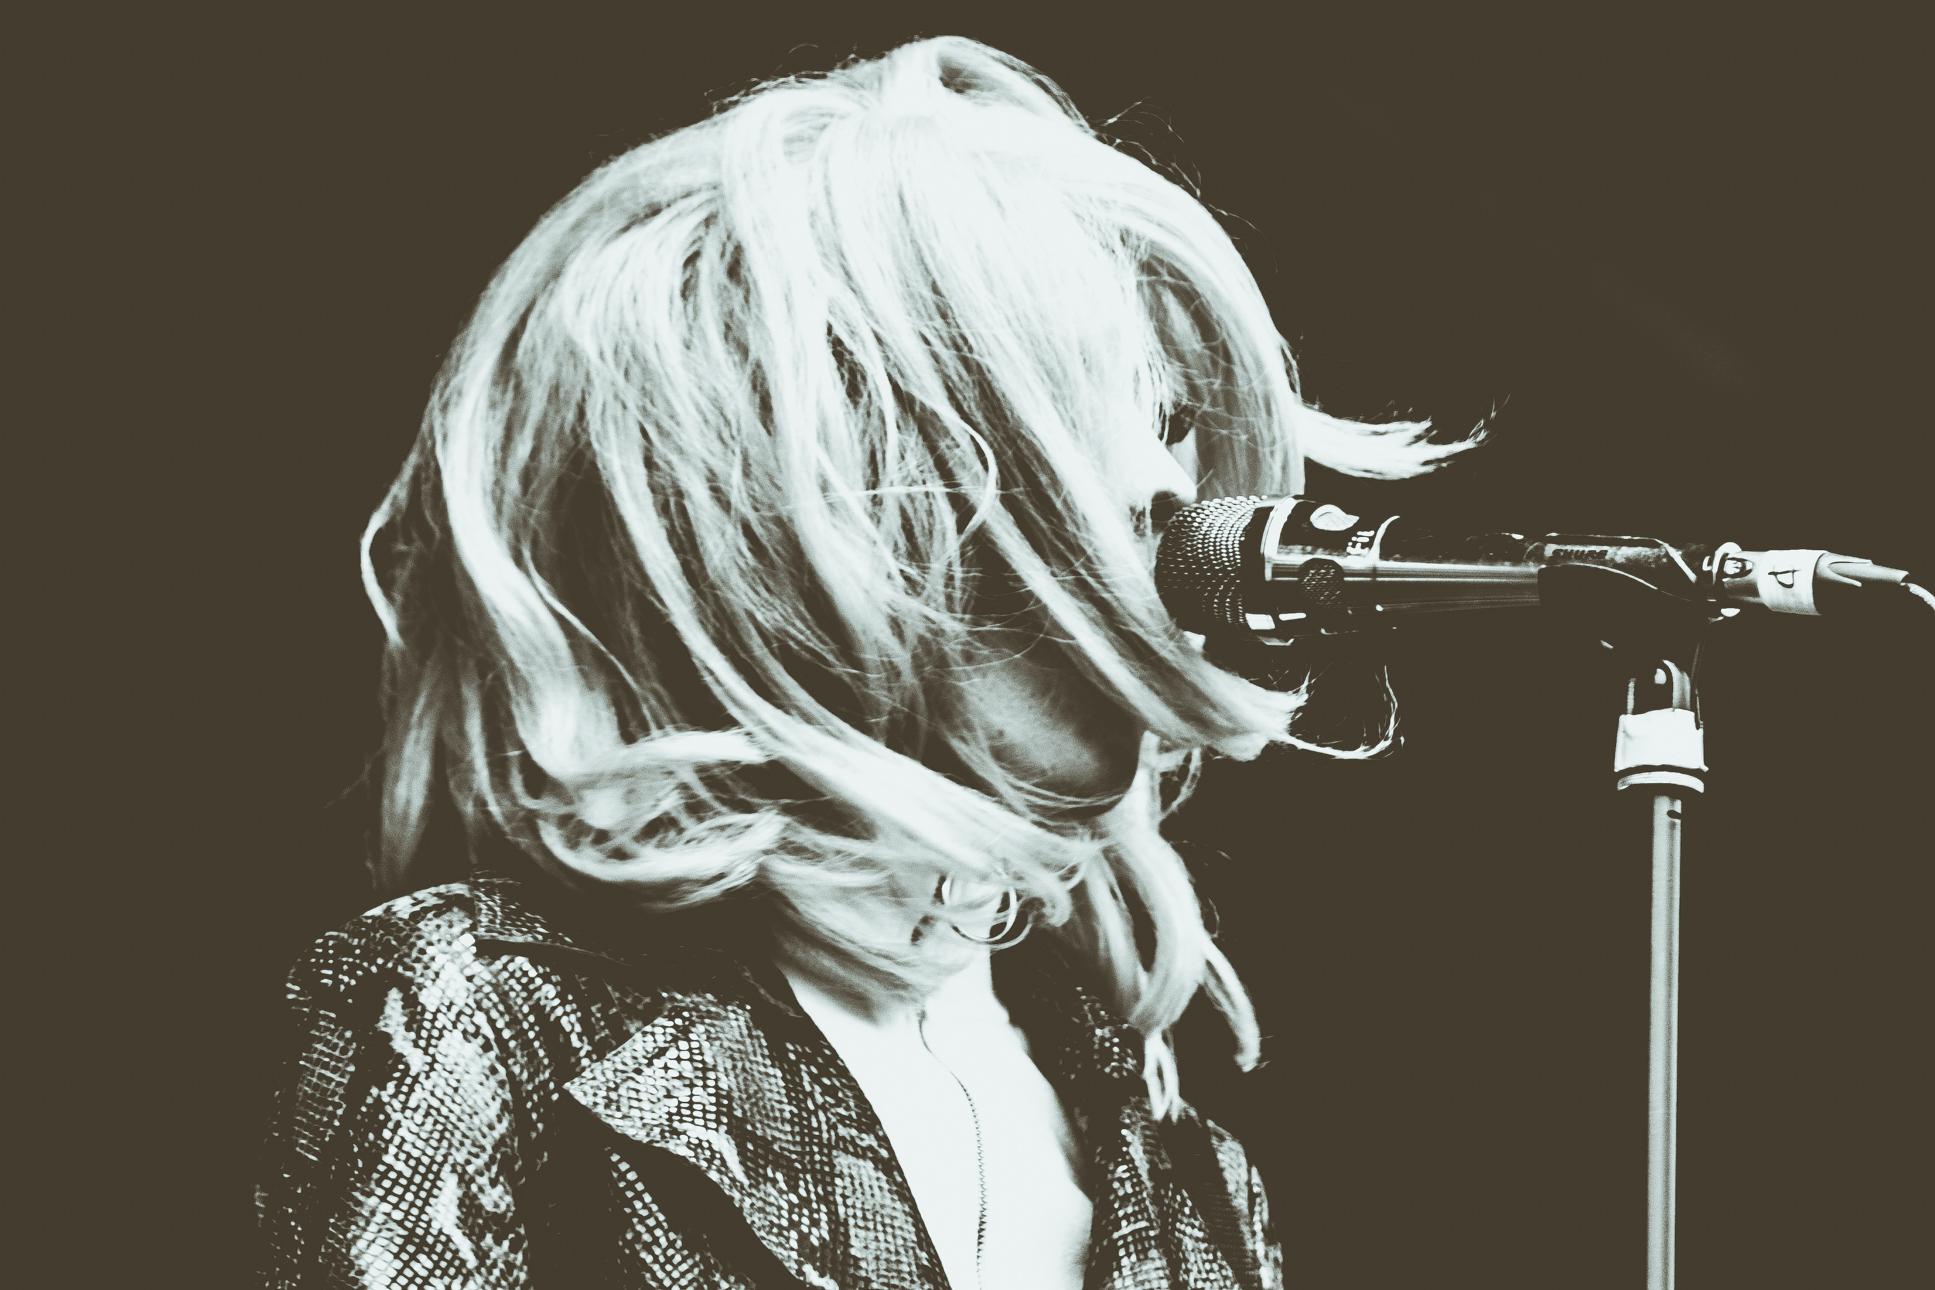 Black Honey - Rize Festival 2018 - Ant Adams-21.jpg